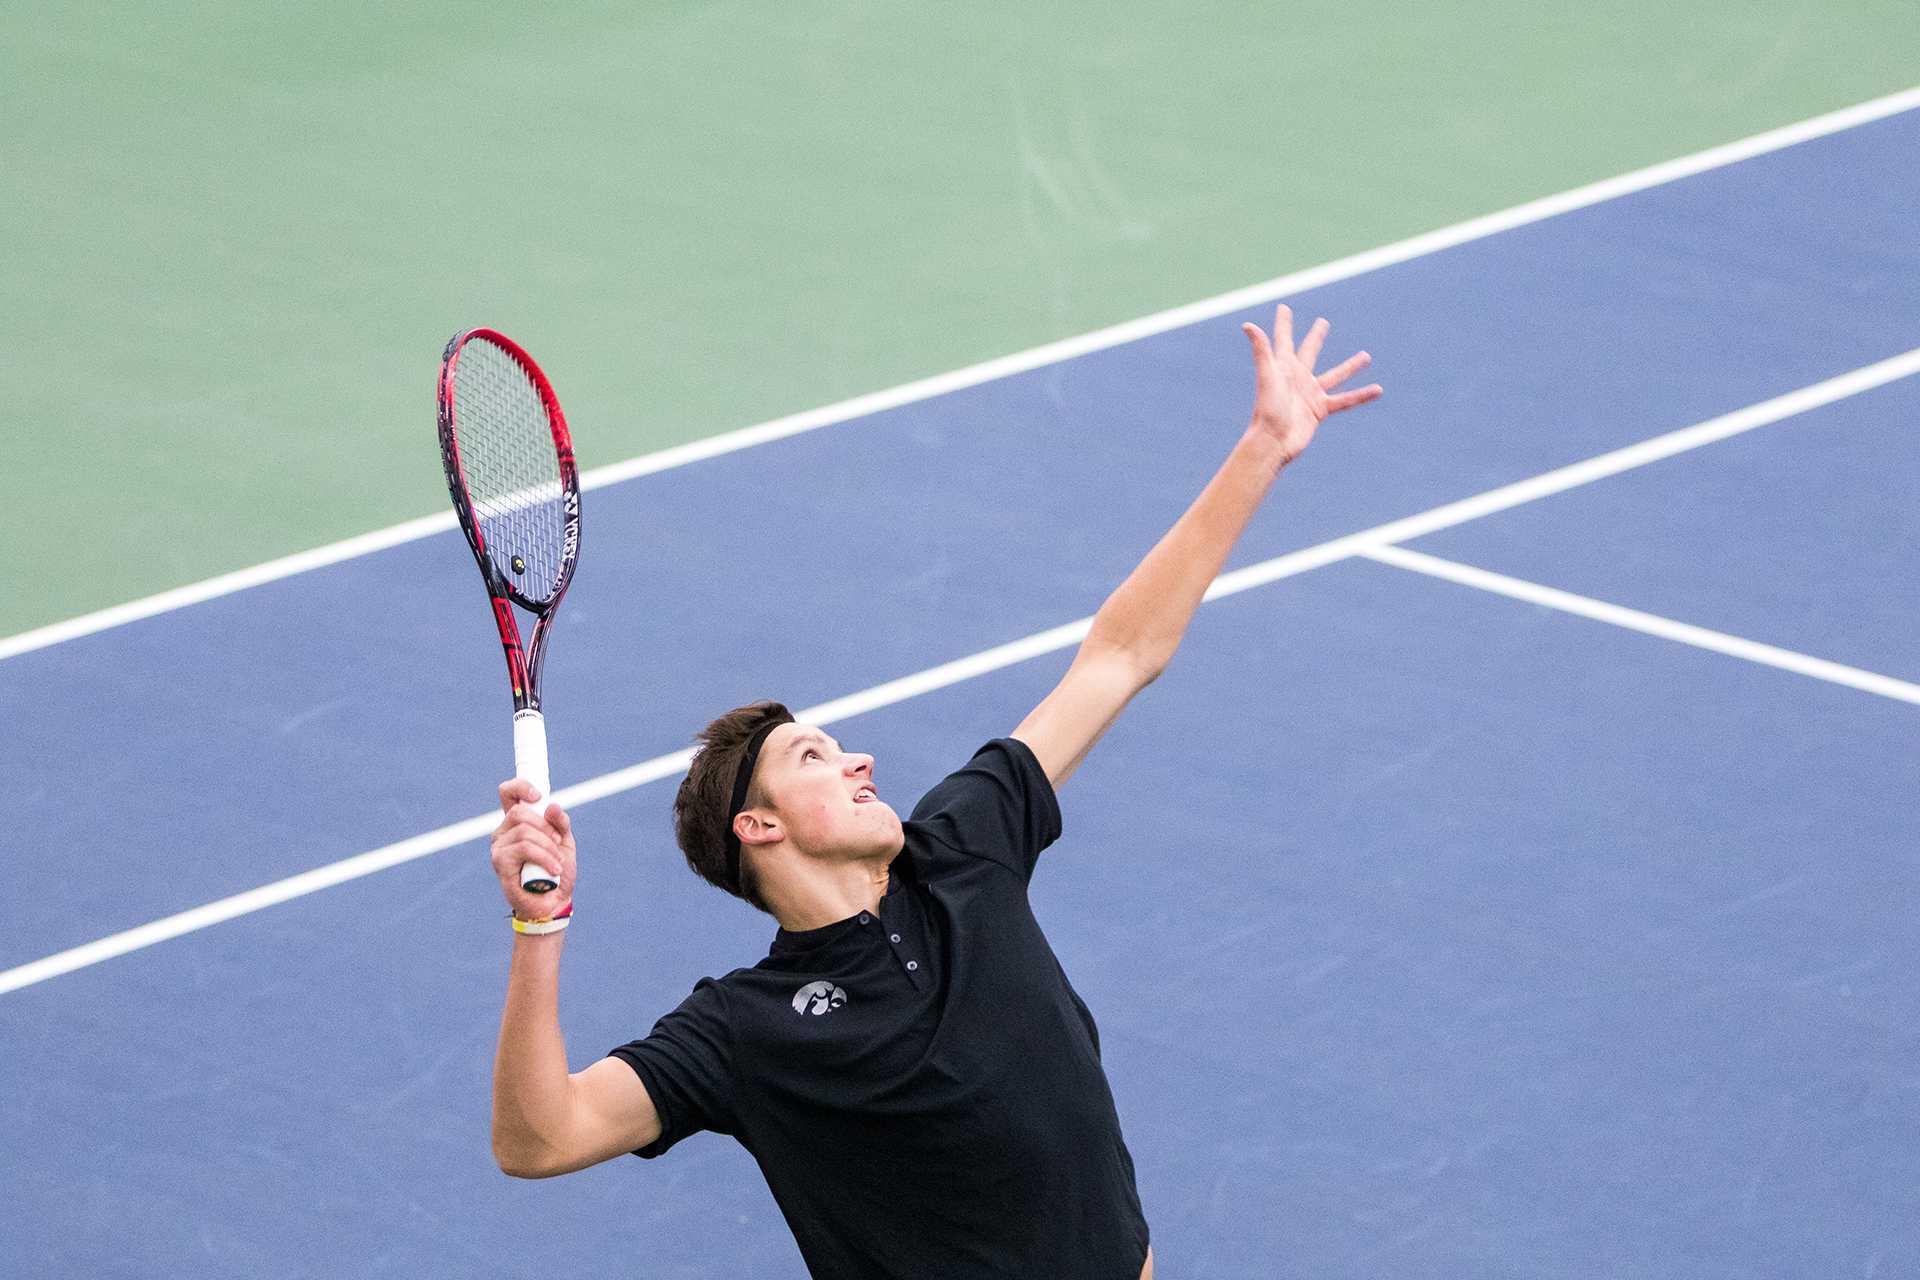 Men's tennis is hopeful for home wins